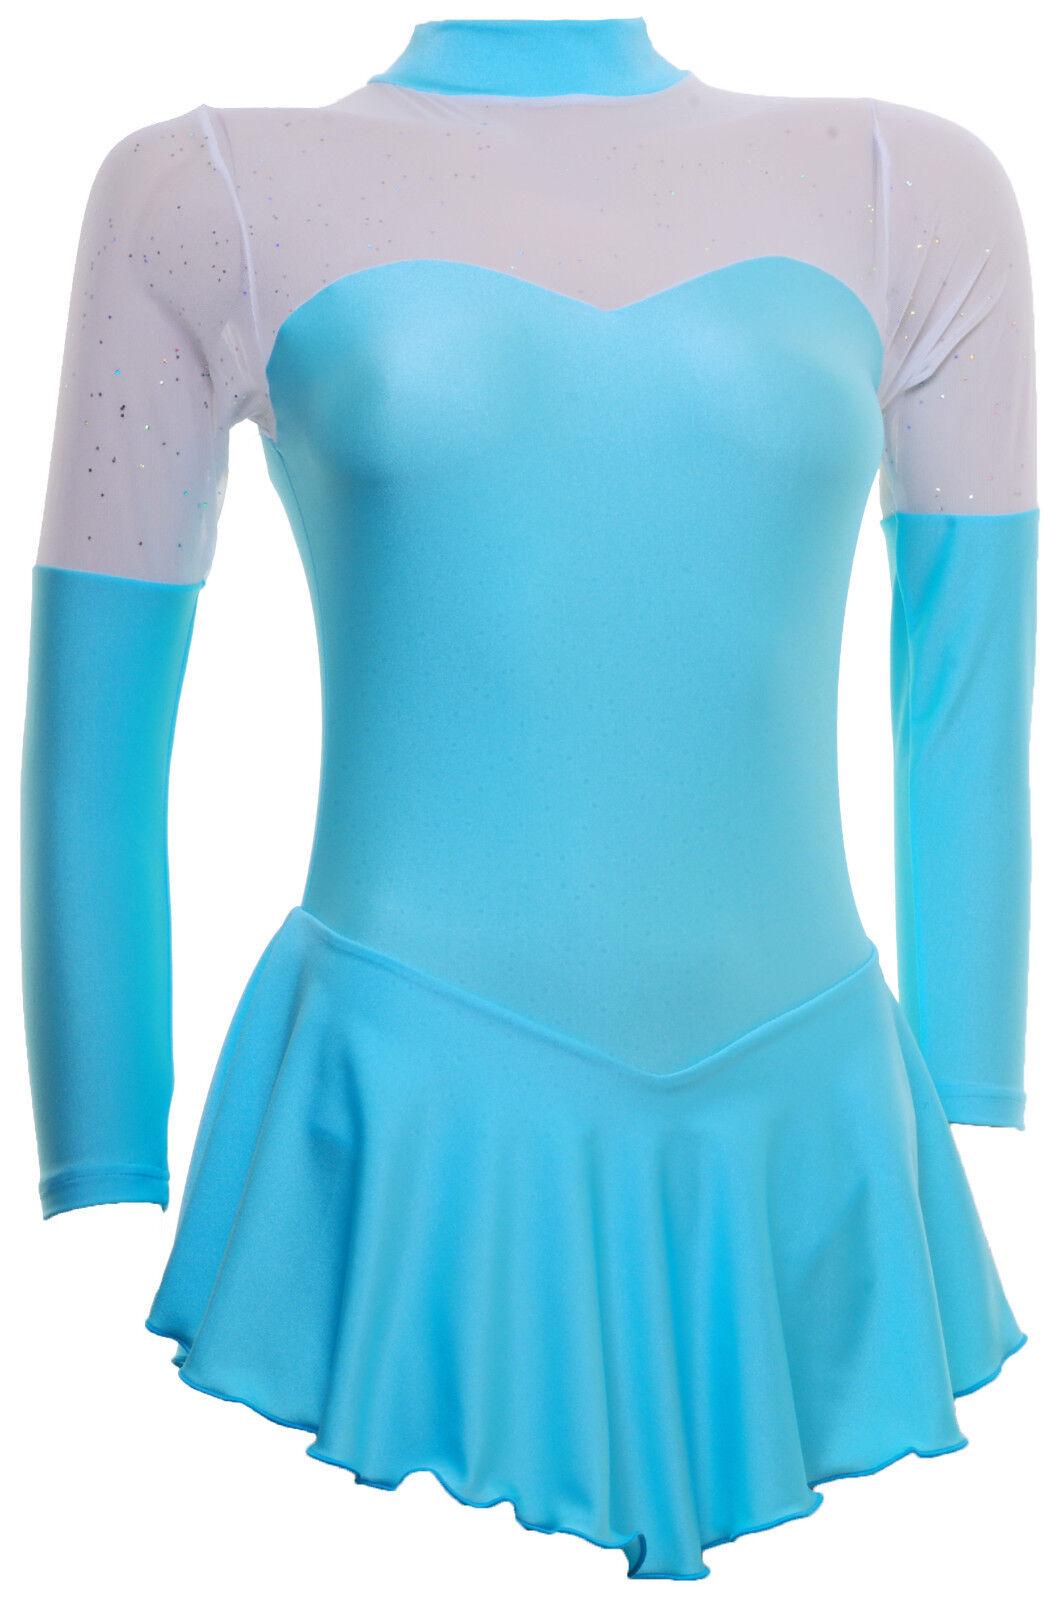 Skating Dress -AQUA LYCRA GLITTER MIST -LONG SLEEVE  ALL SIZES AVAILABLE